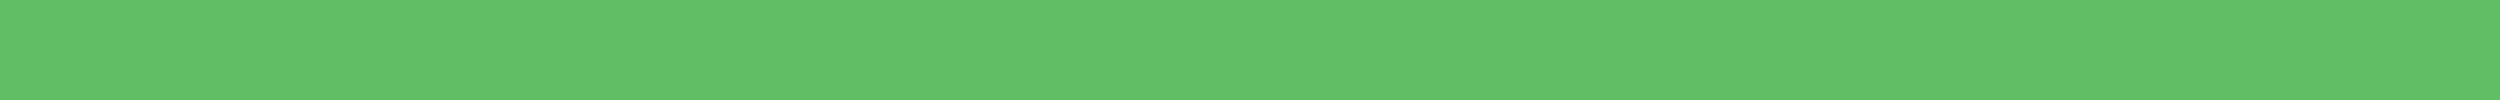 Groene-balk